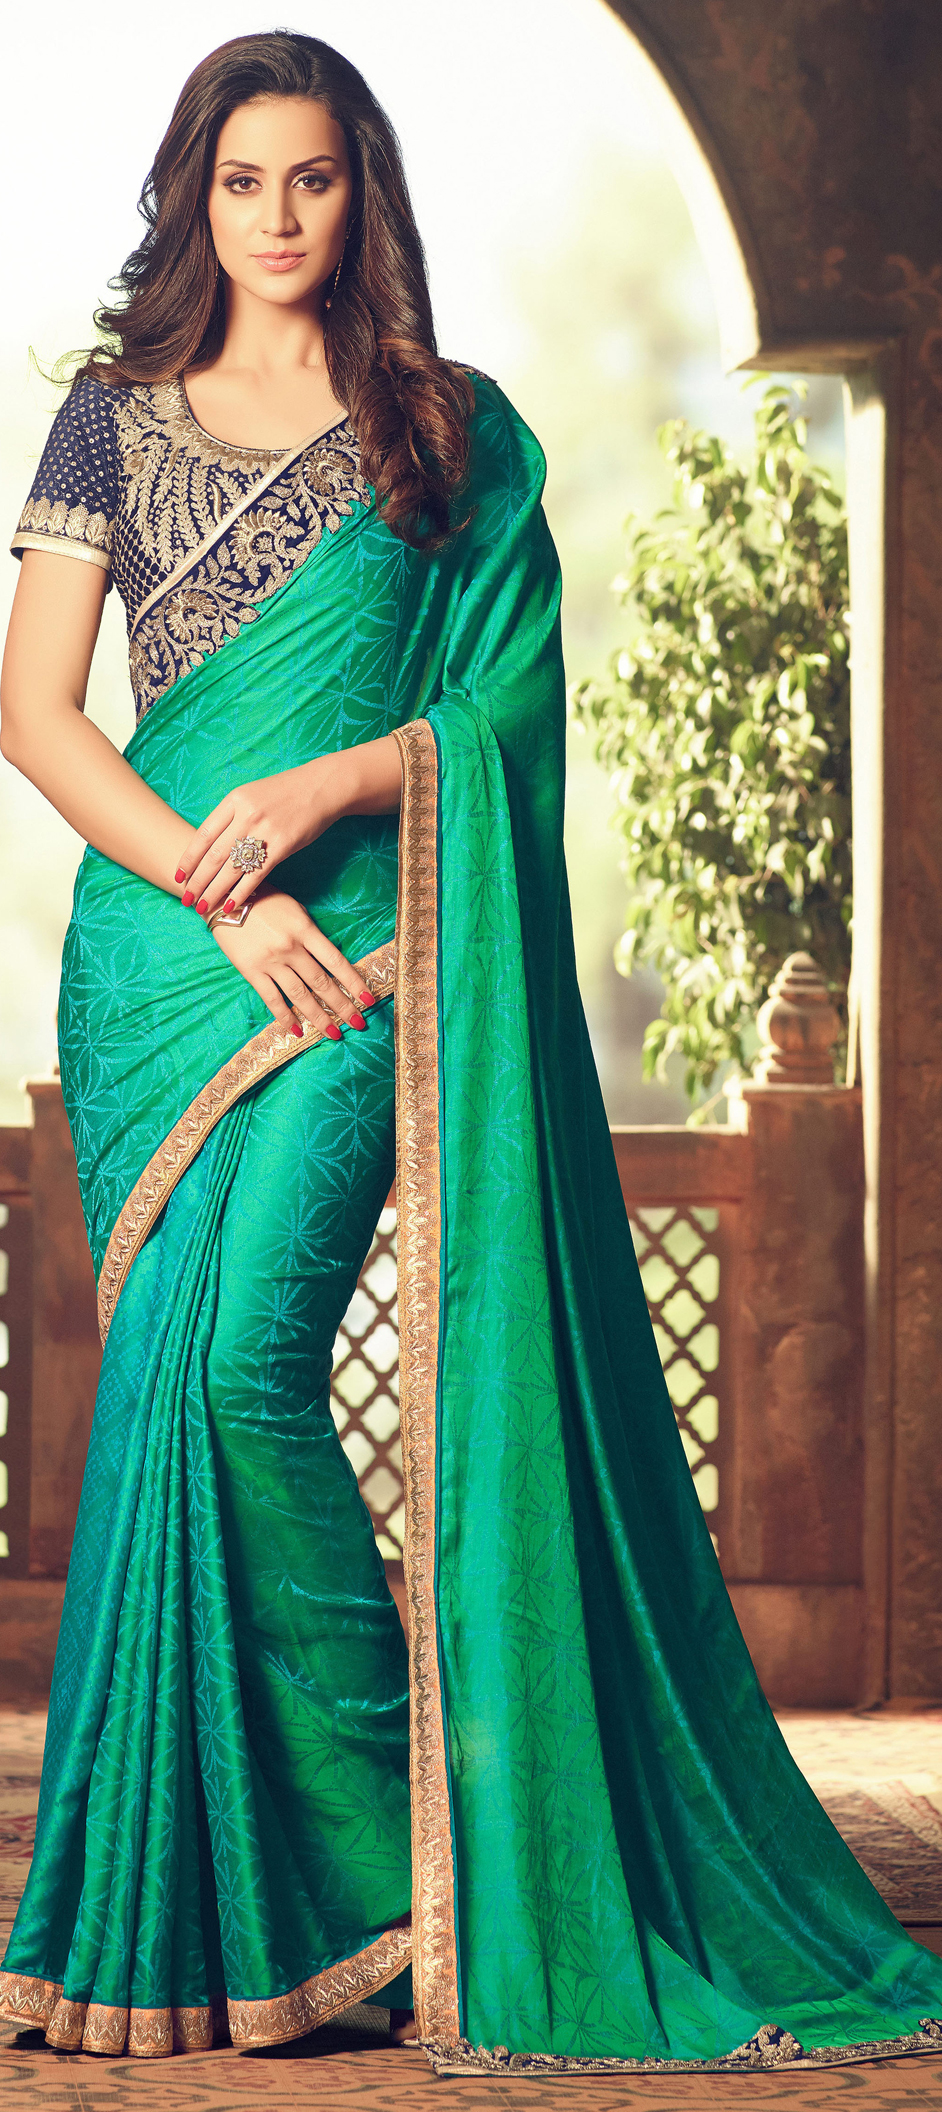 Indianweddingsaree blog | Complete Women Clothing Store